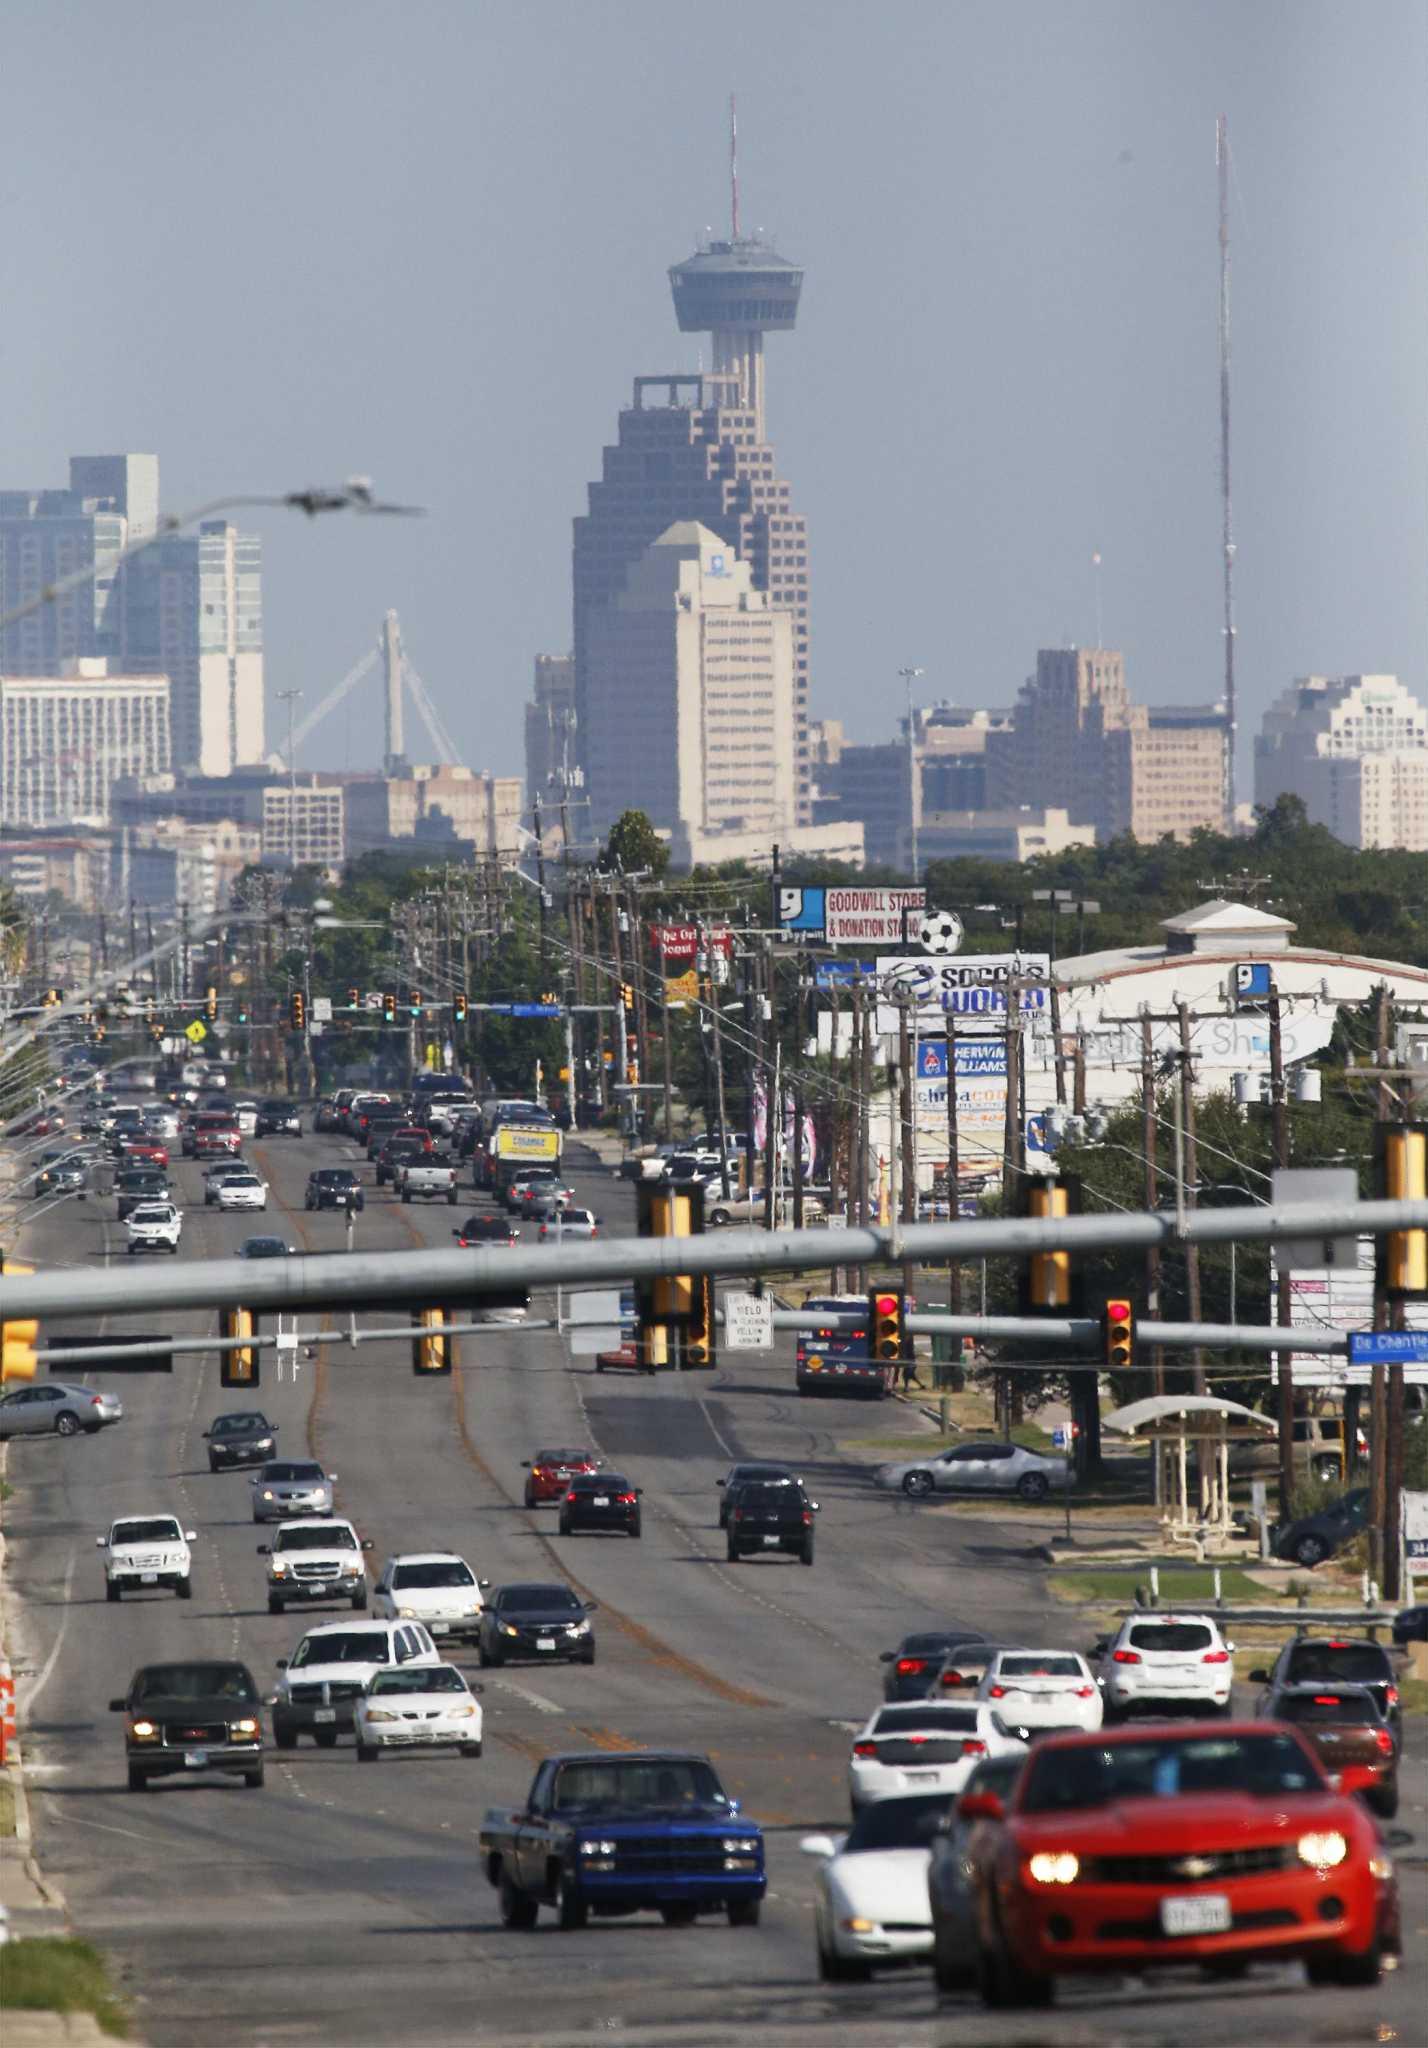 Ozone warning issued for San Antonio